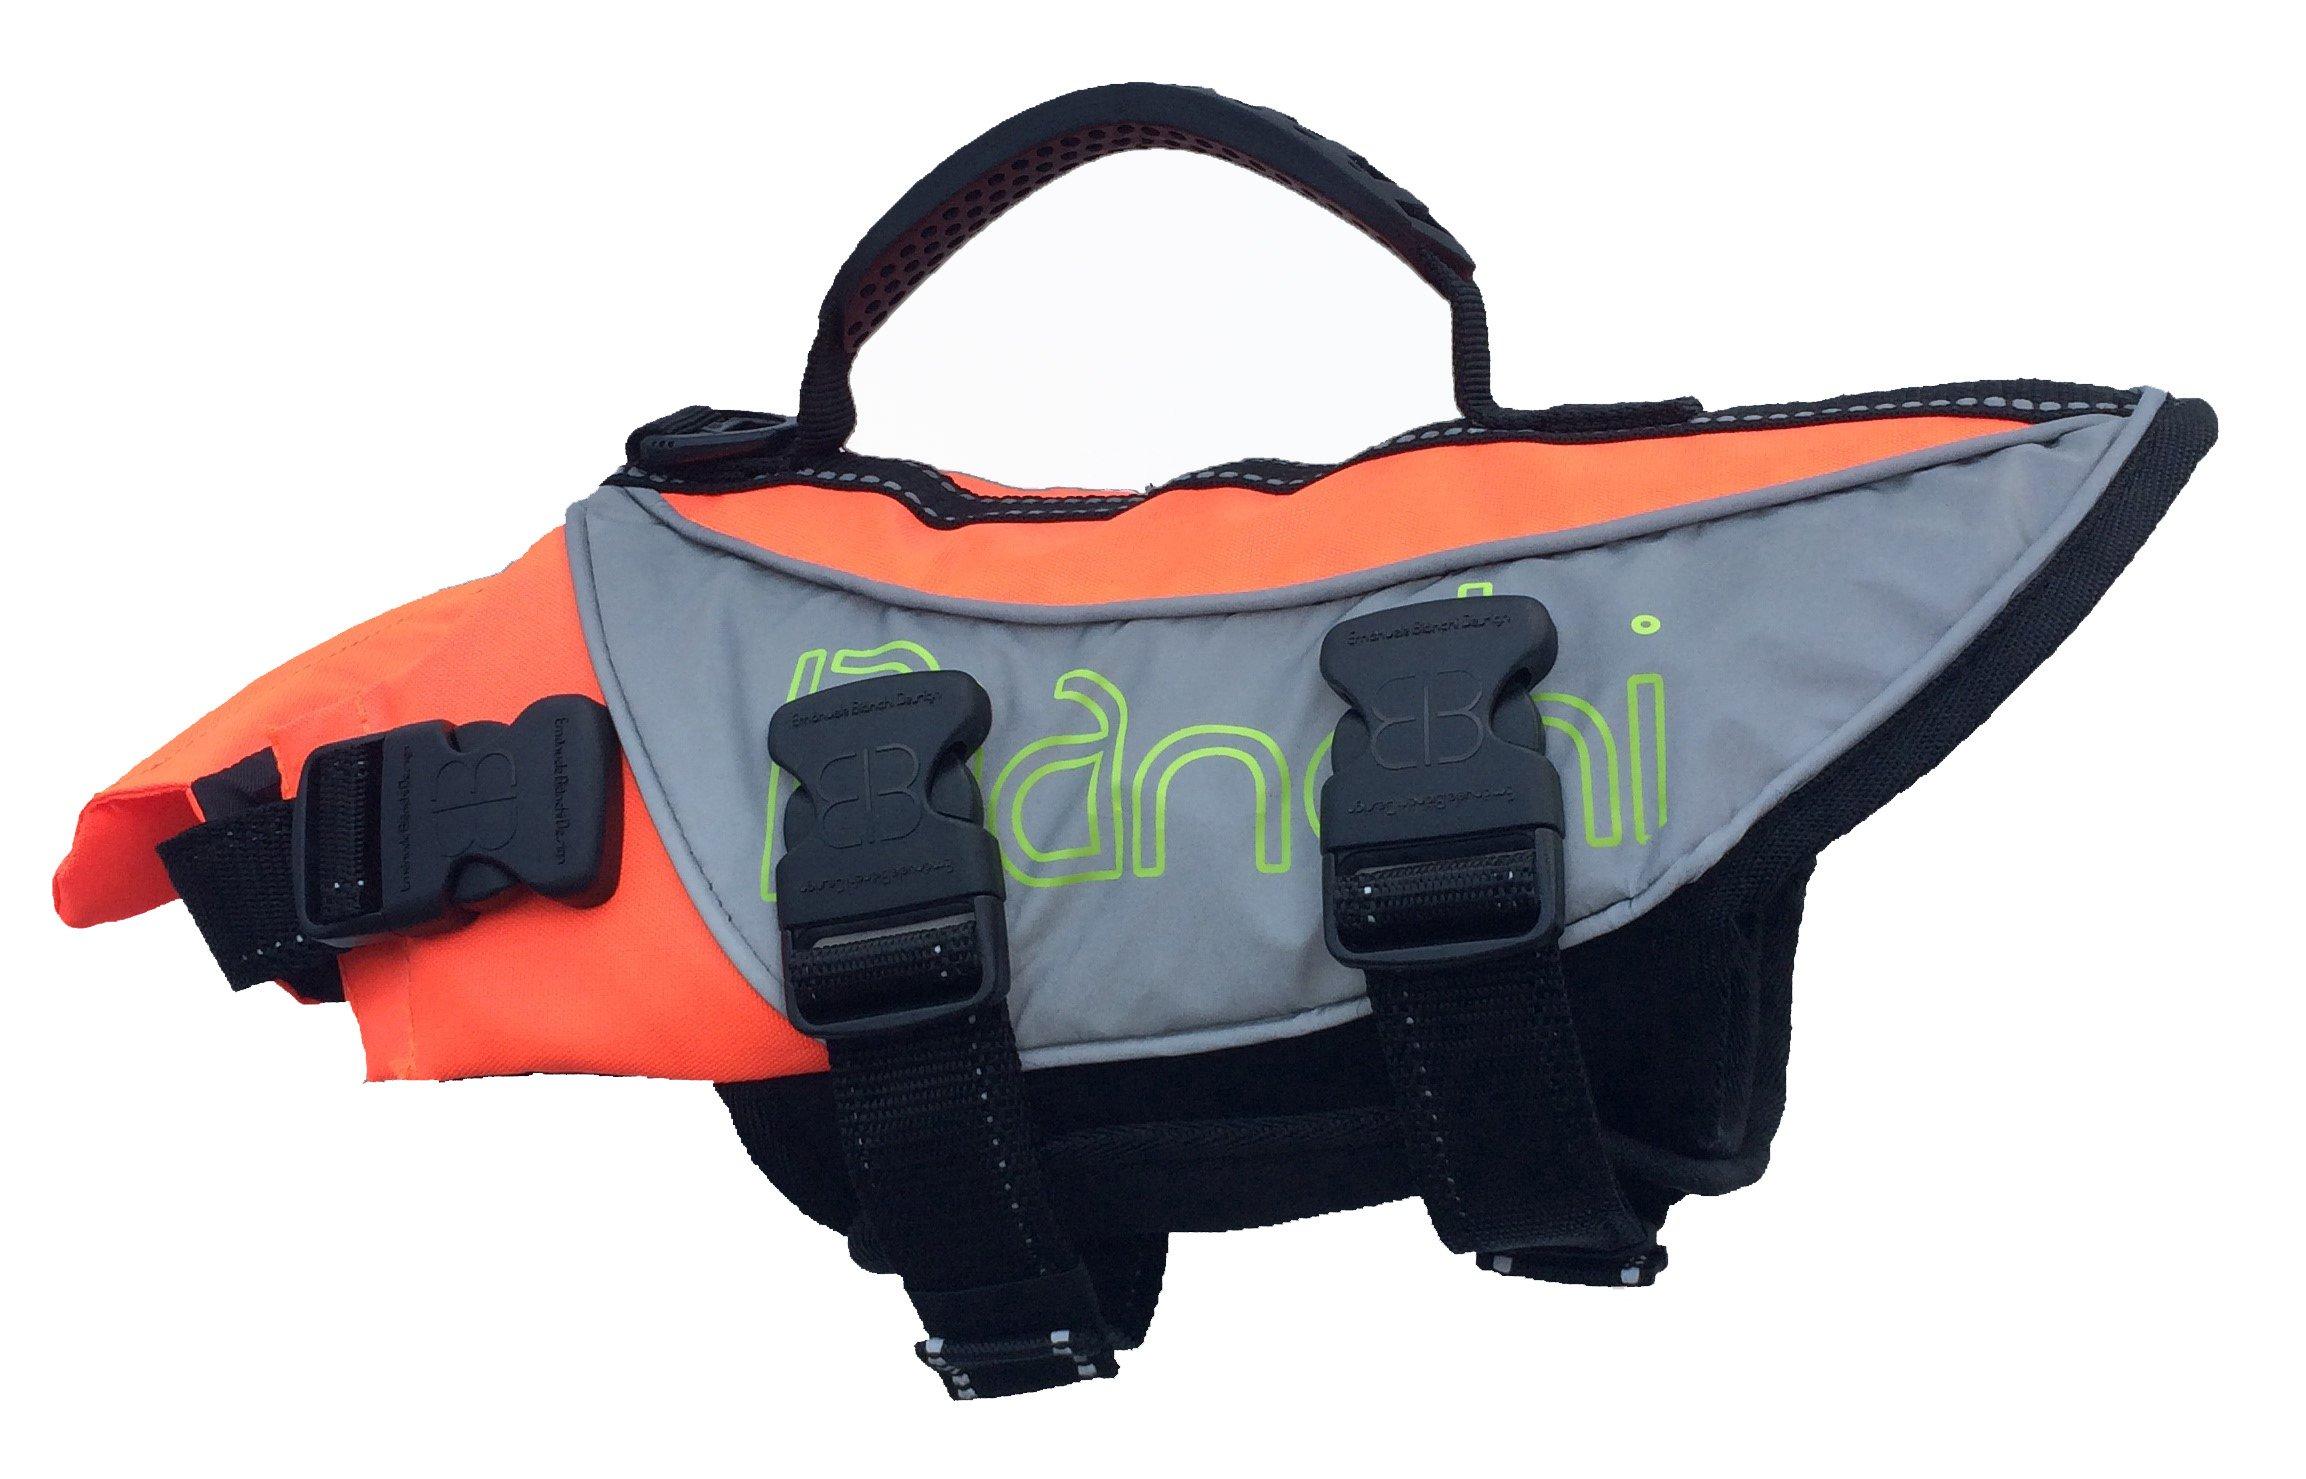 Petego Salty Dog Pet Life Vest, X-Large, Fits Girth 42 to 52-Inch, Orange